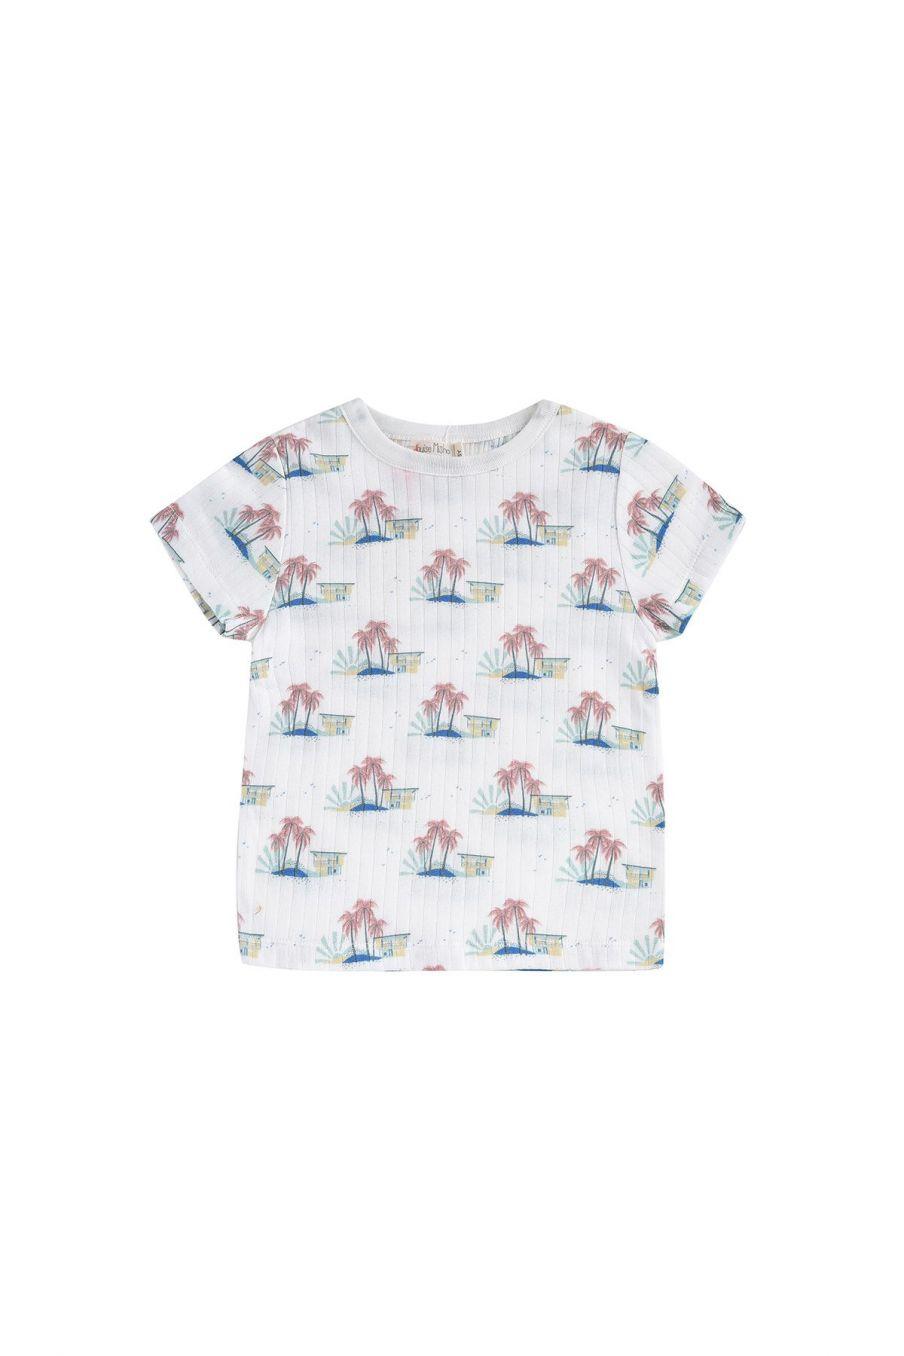 boheme chic vintage t-shirt garcon atayo off-white hawaï